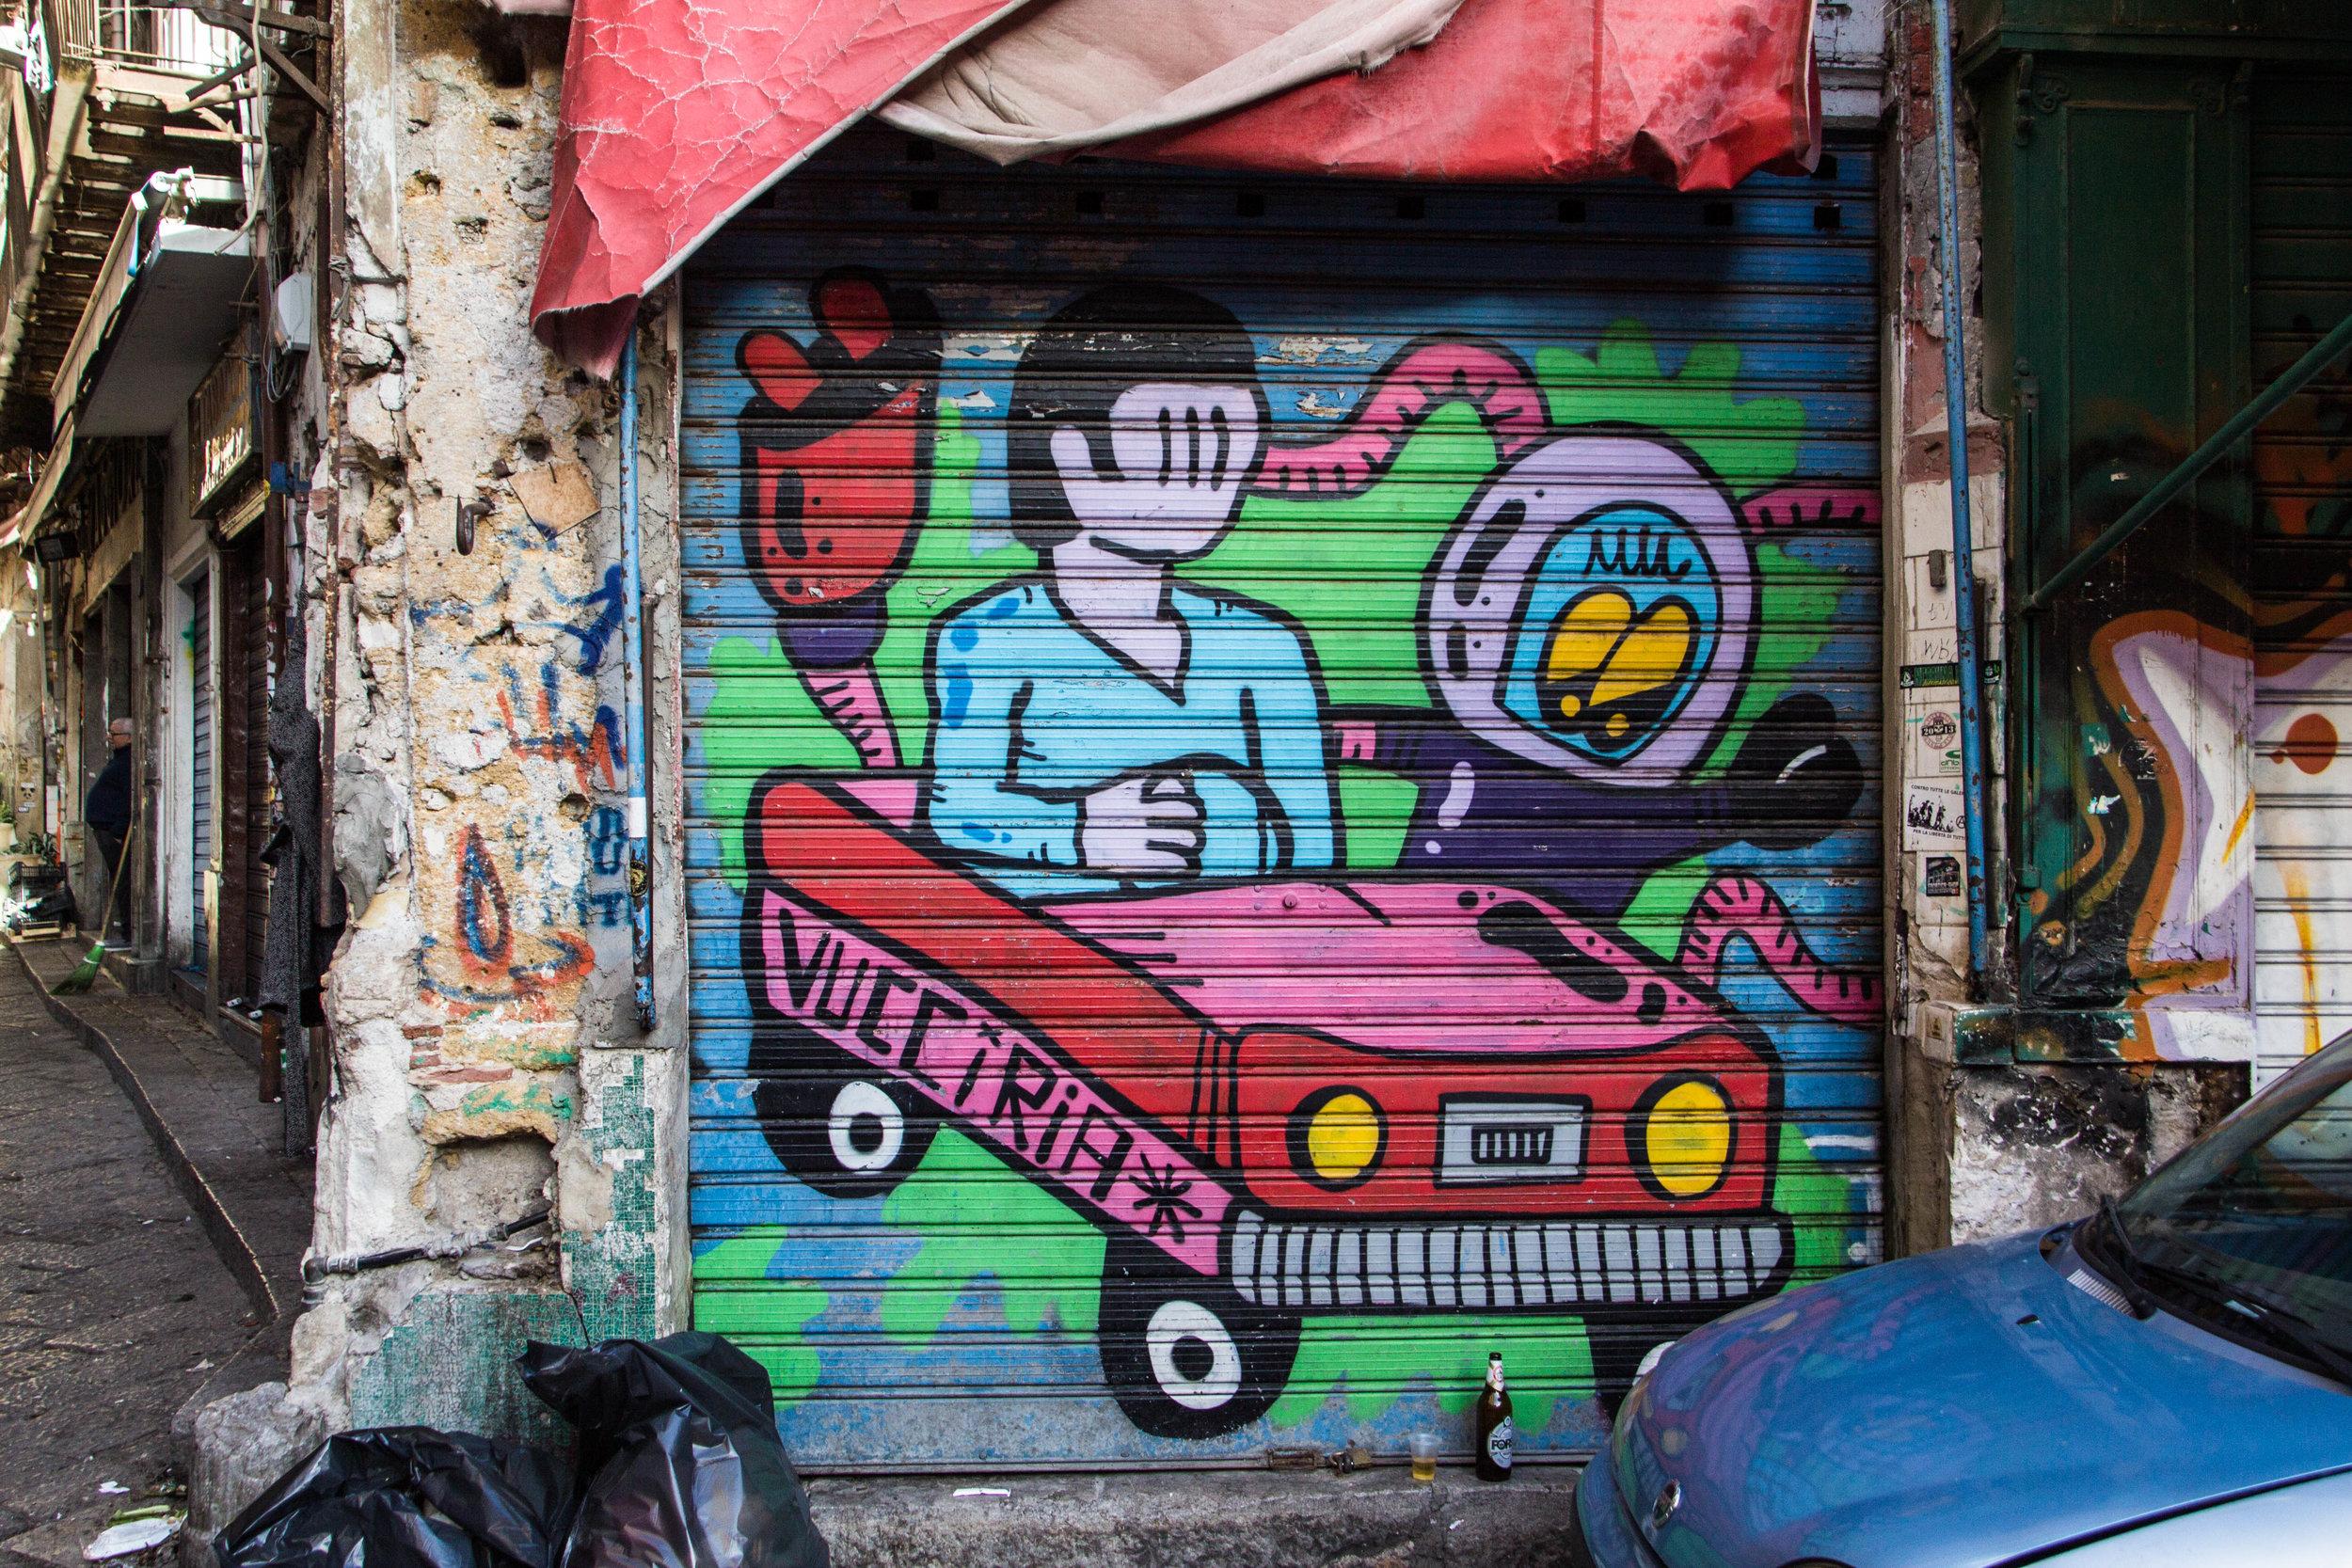 street-art-palermo-sicily-21.jpg